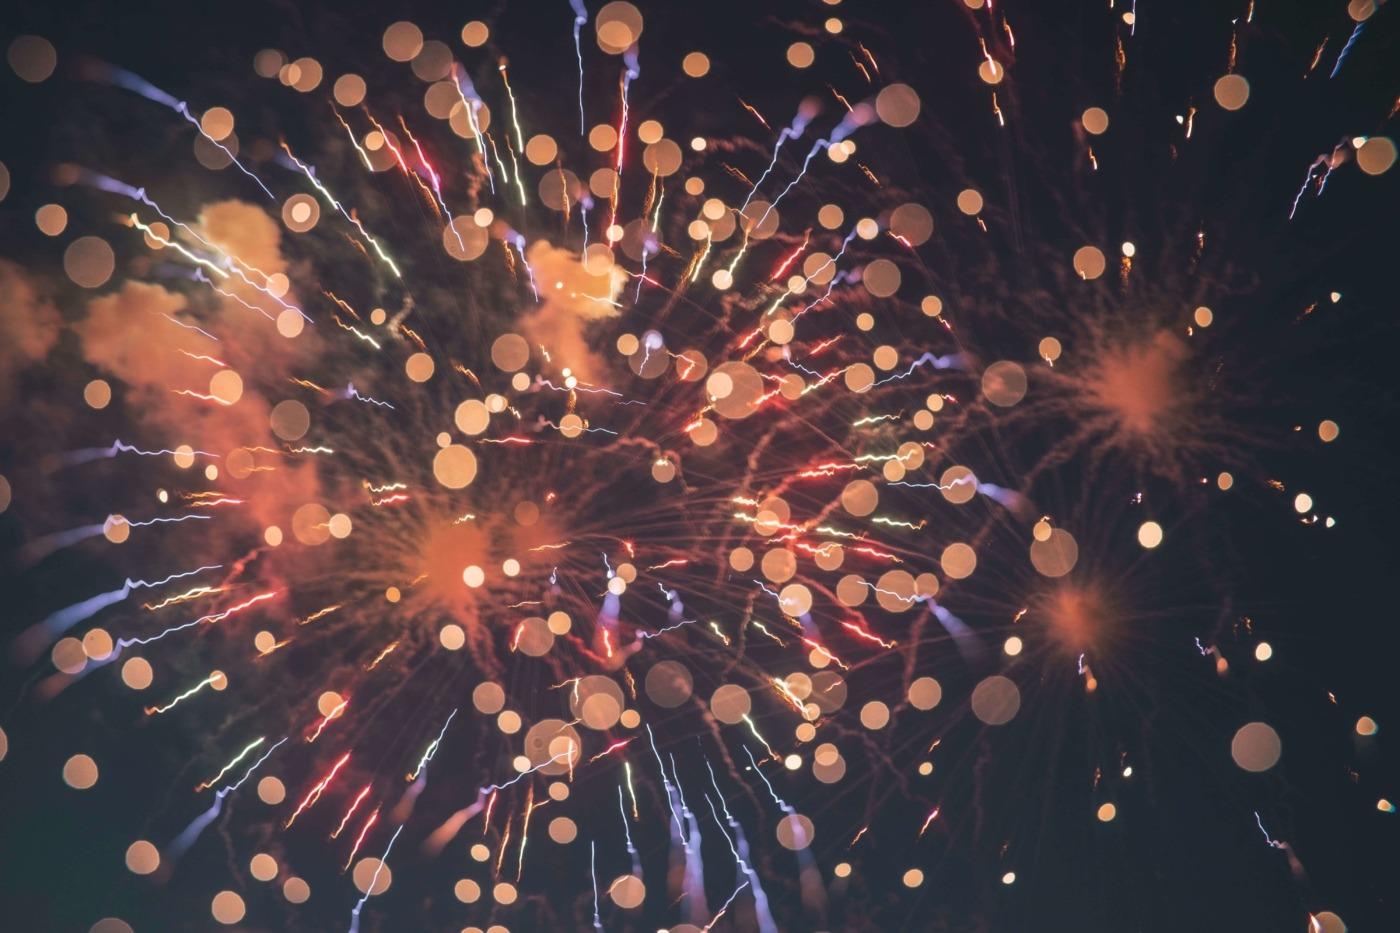 Fireworks/ Image: Unsplash